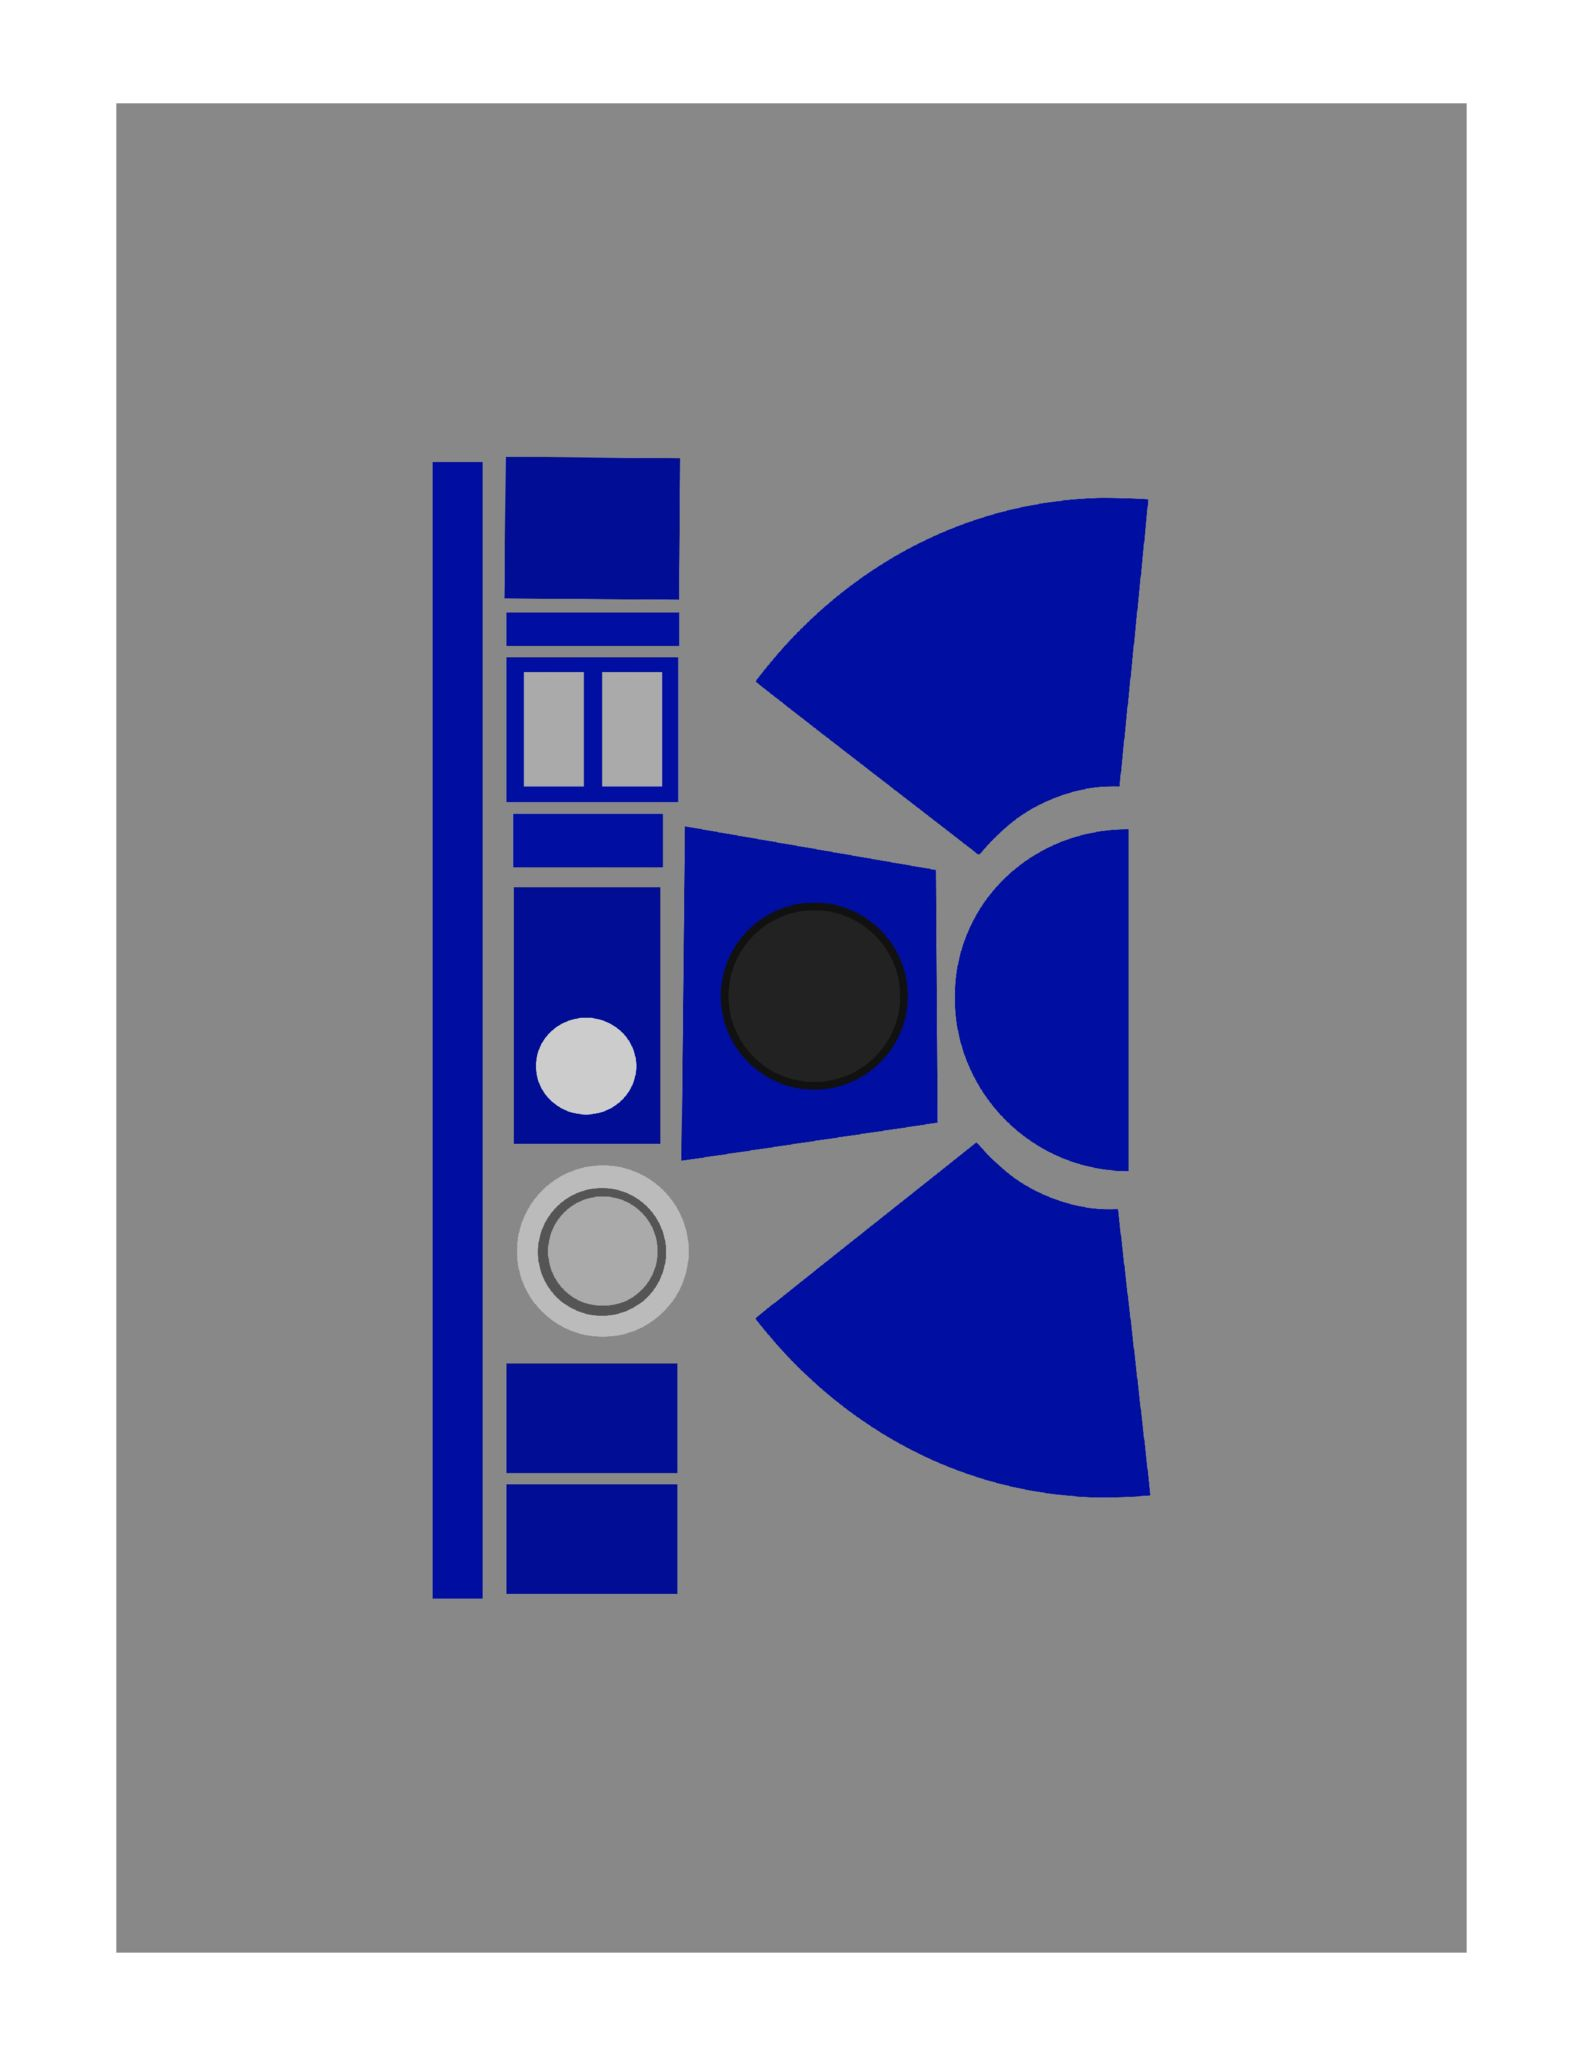 image regarding R2d2 Printable identified as R2D2 Valentine Box Printable - South Lumina Structure